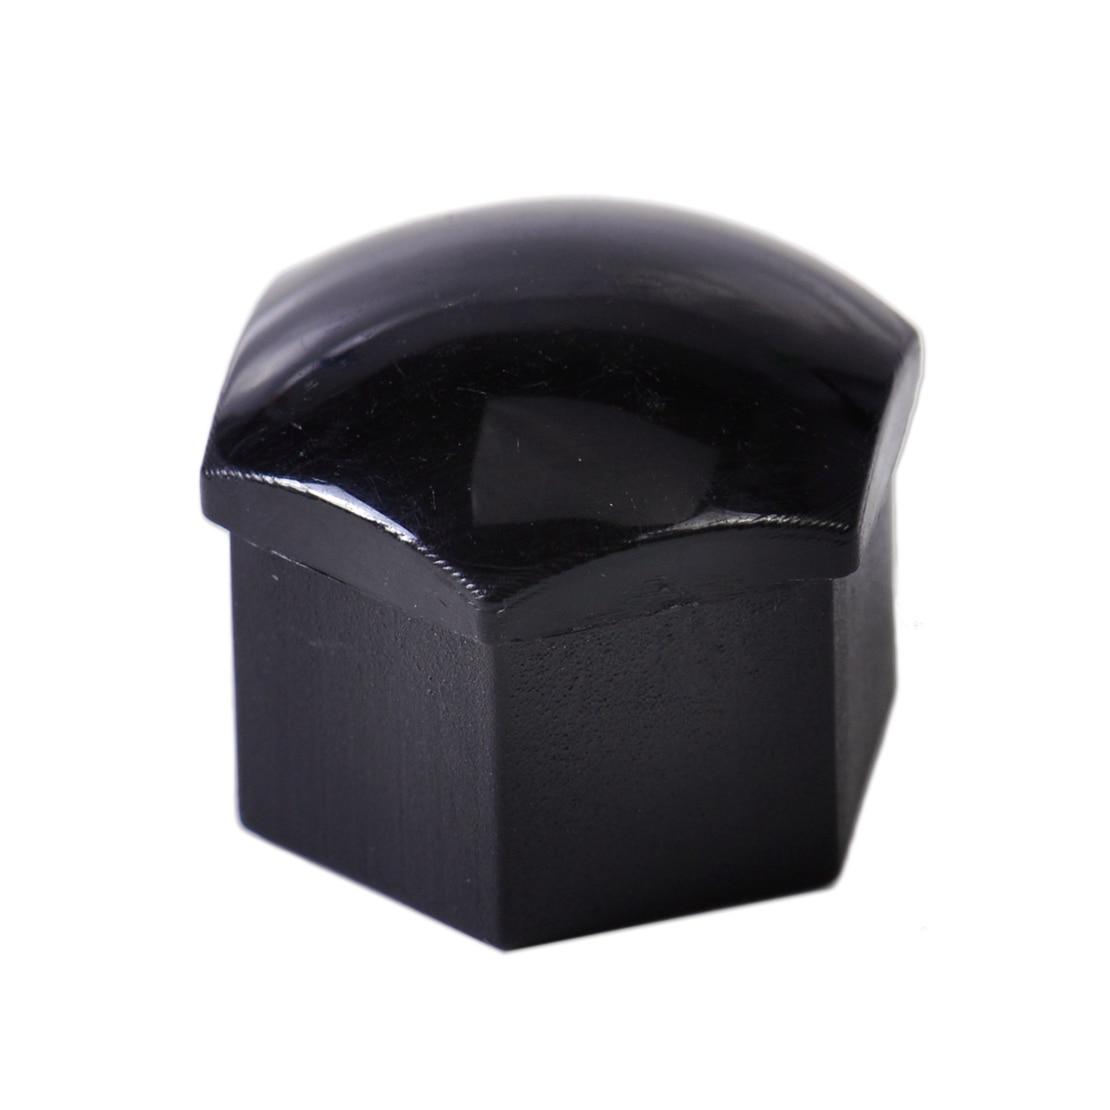 beler 16Pcs Car Wheel Lug Bolt Center Nut Covers Caps for Audi VW SKODA SEAT with 17mm Hexagon bolt 321601173, 321 601 173A